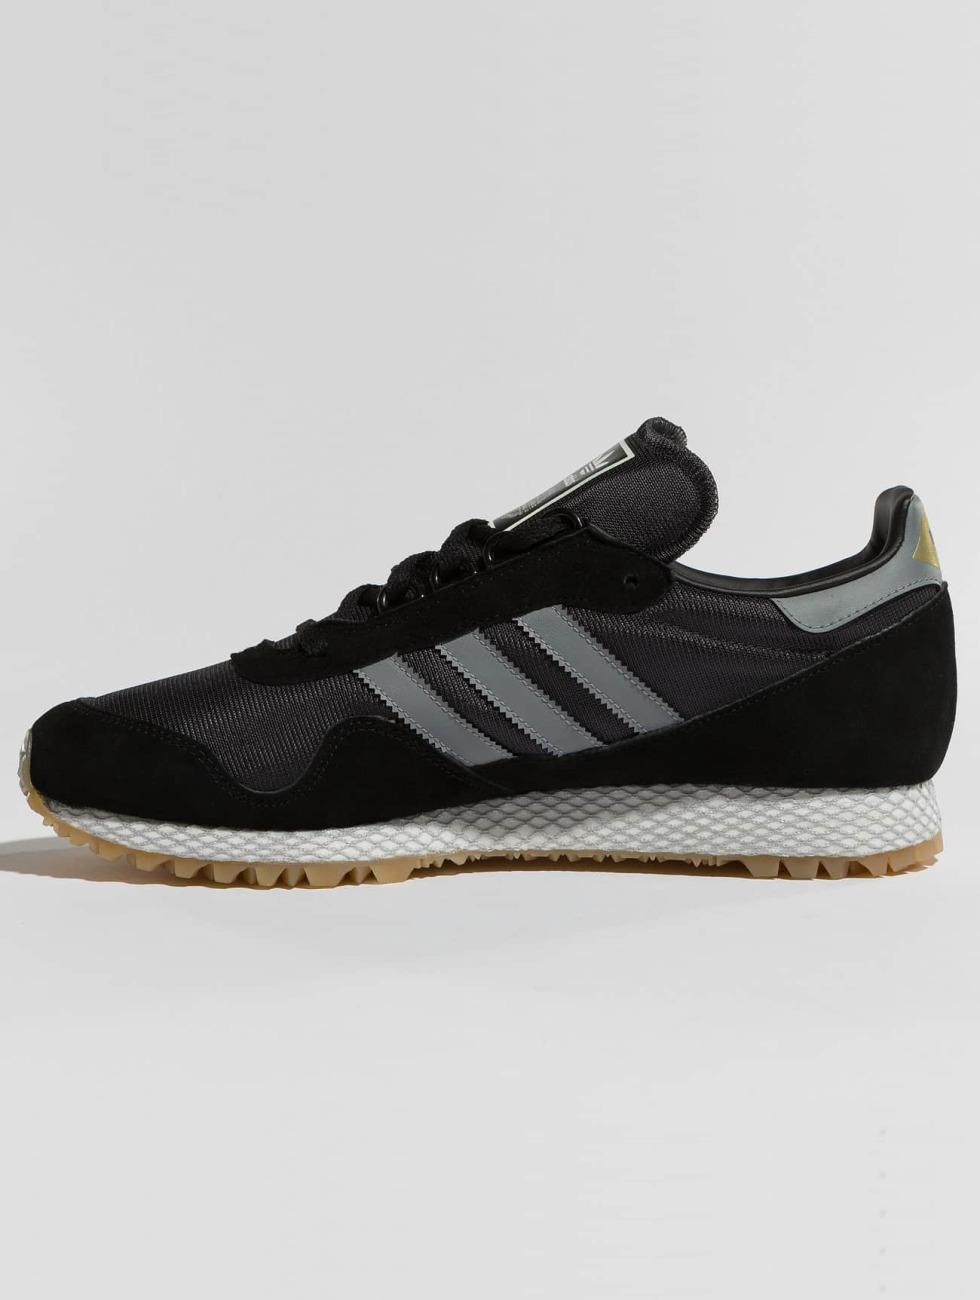 Adidas Originals Sko / Sneaker Ny Yorck Sort 478799 Betale Med Visa Billig Pris Sneakernews For Salg Klaring Topp Kvalitet OGeWF